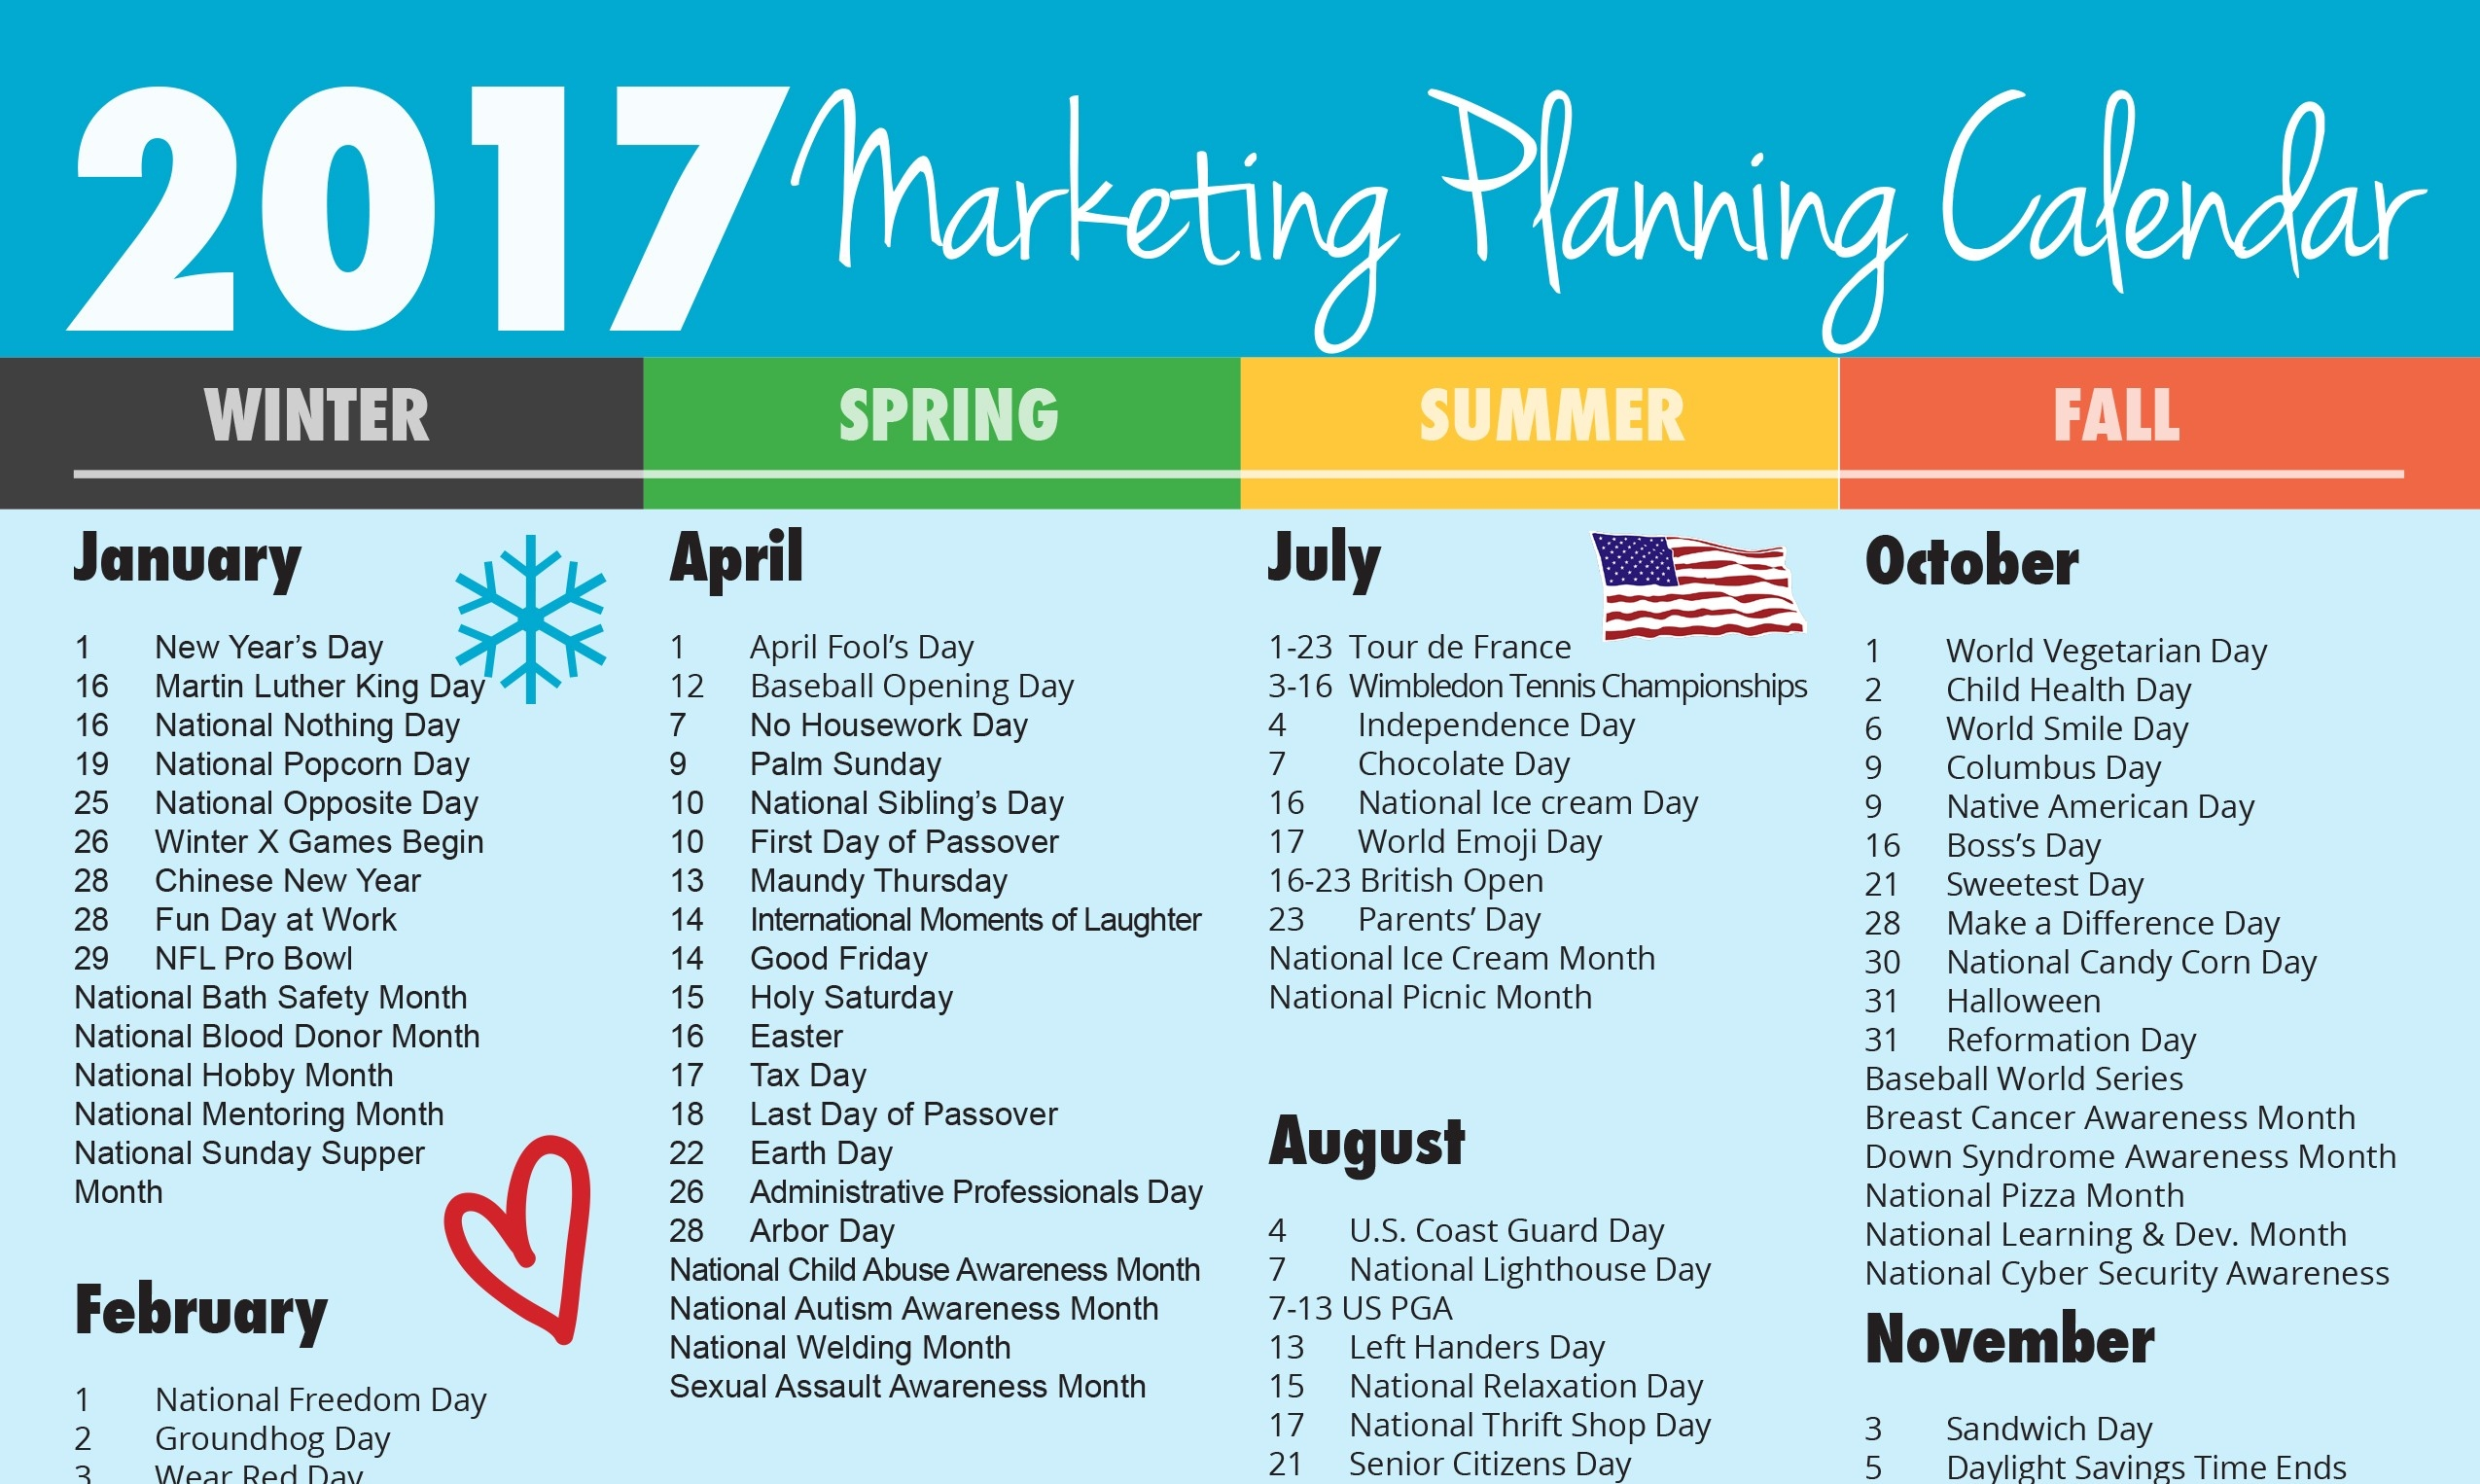 Ultimate 2017 Marketing Planning Calendar - Vandenberg Web +-August Monthly Awareness Calendar